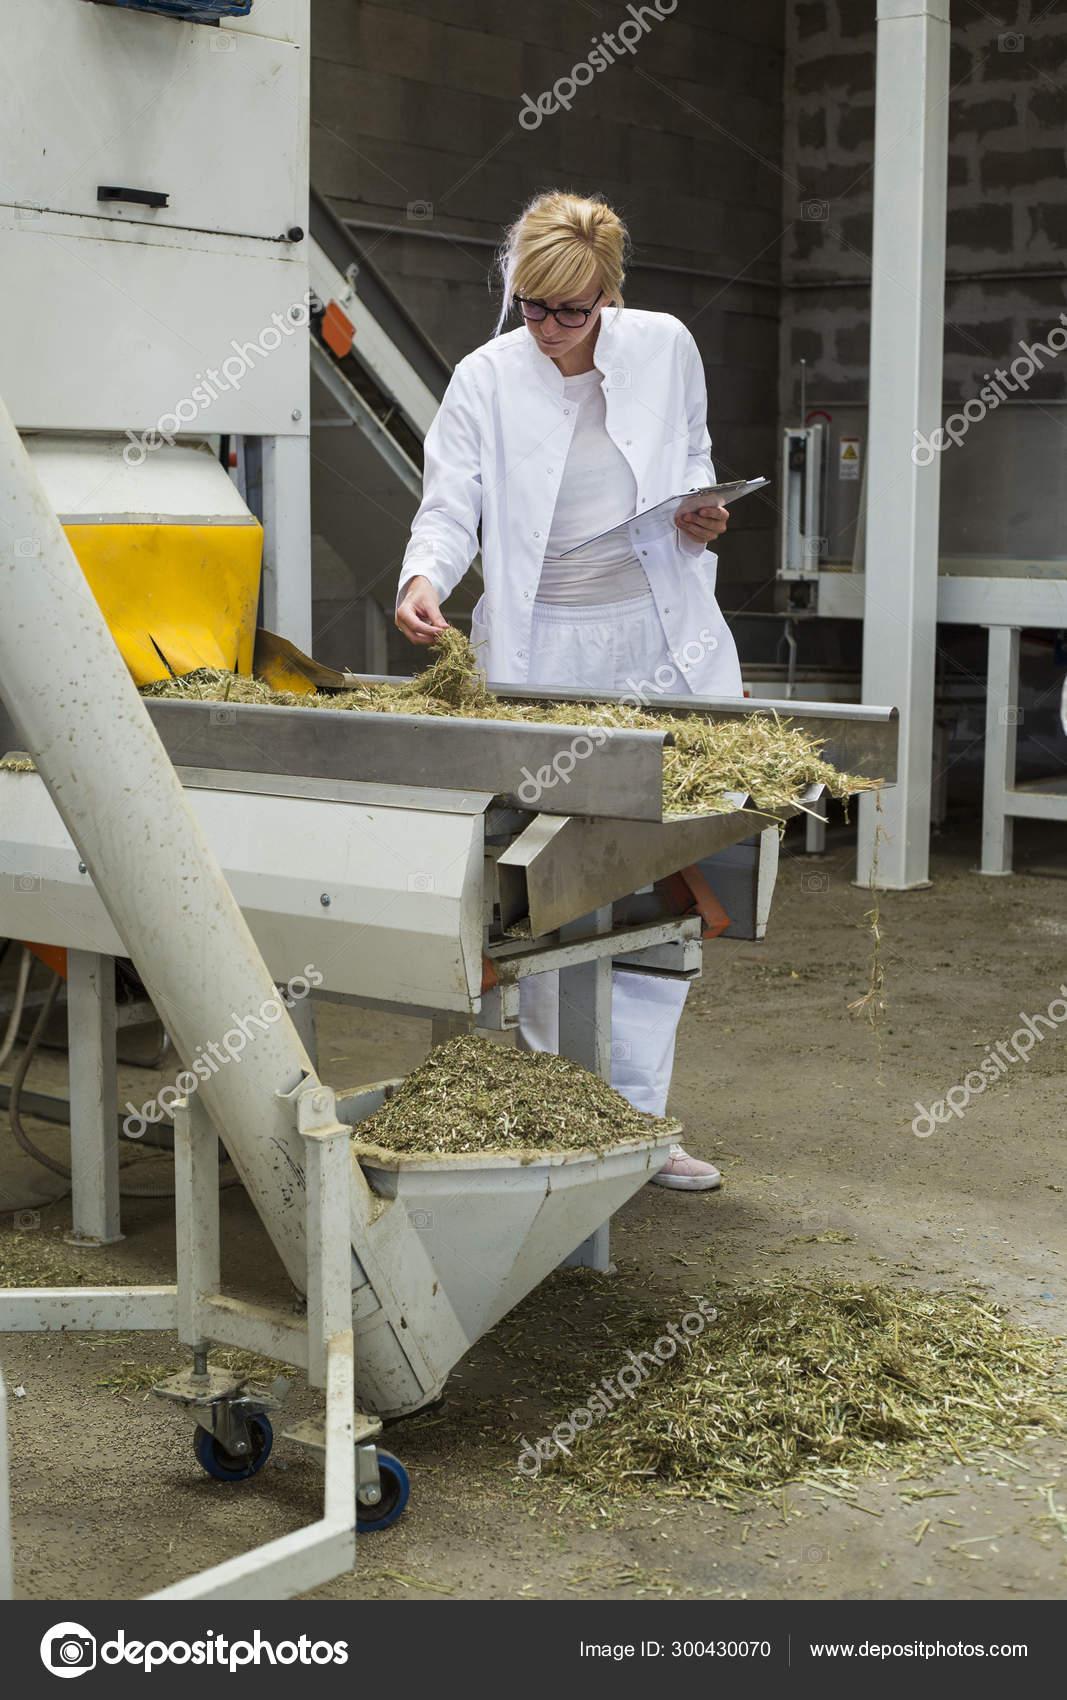 Scientist observing dry CBD hemp plants by the sorting